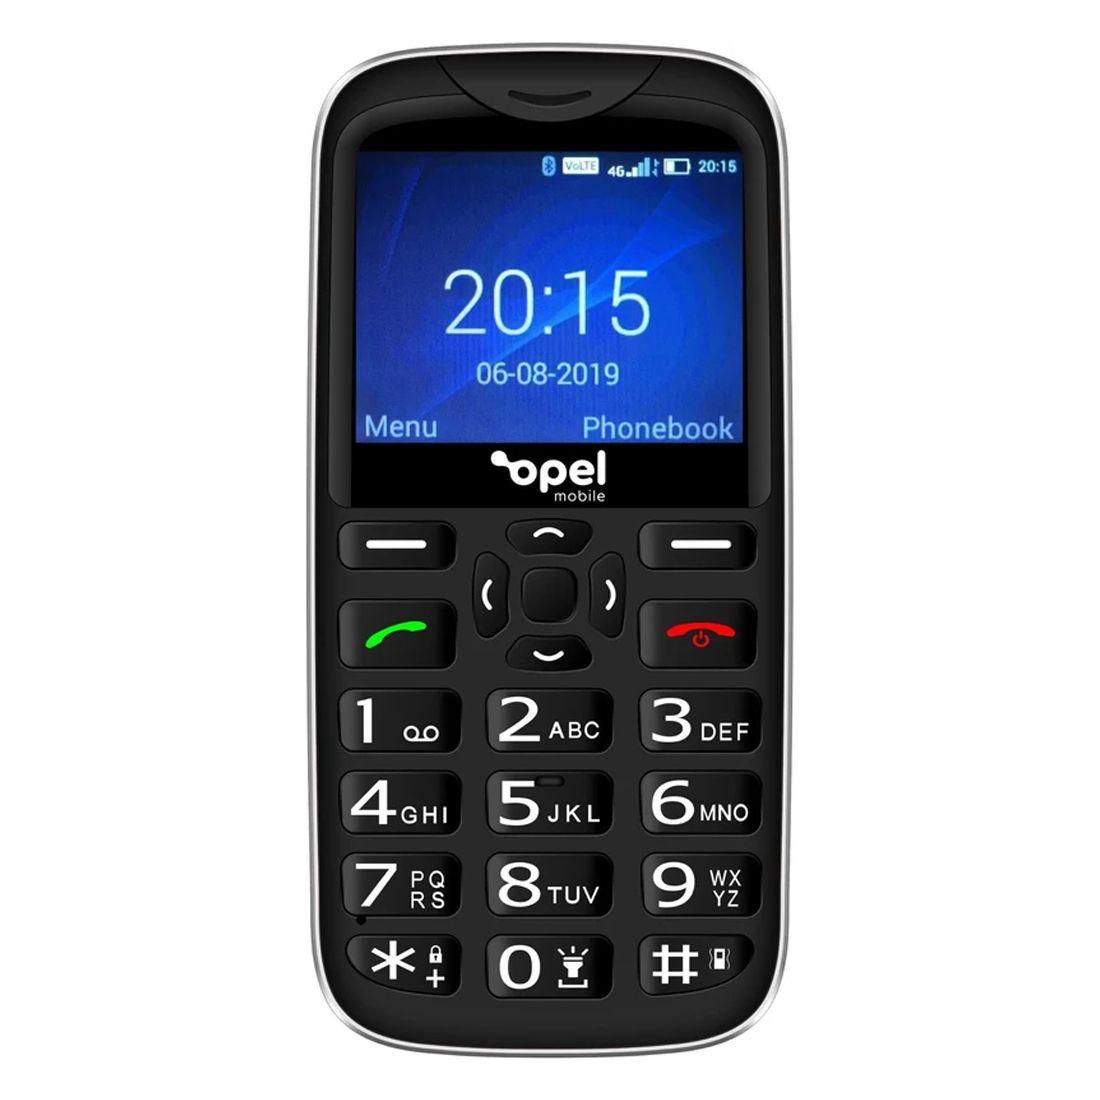 Opel Mobile BigButton X (4G/LTE, Keypad) - Black